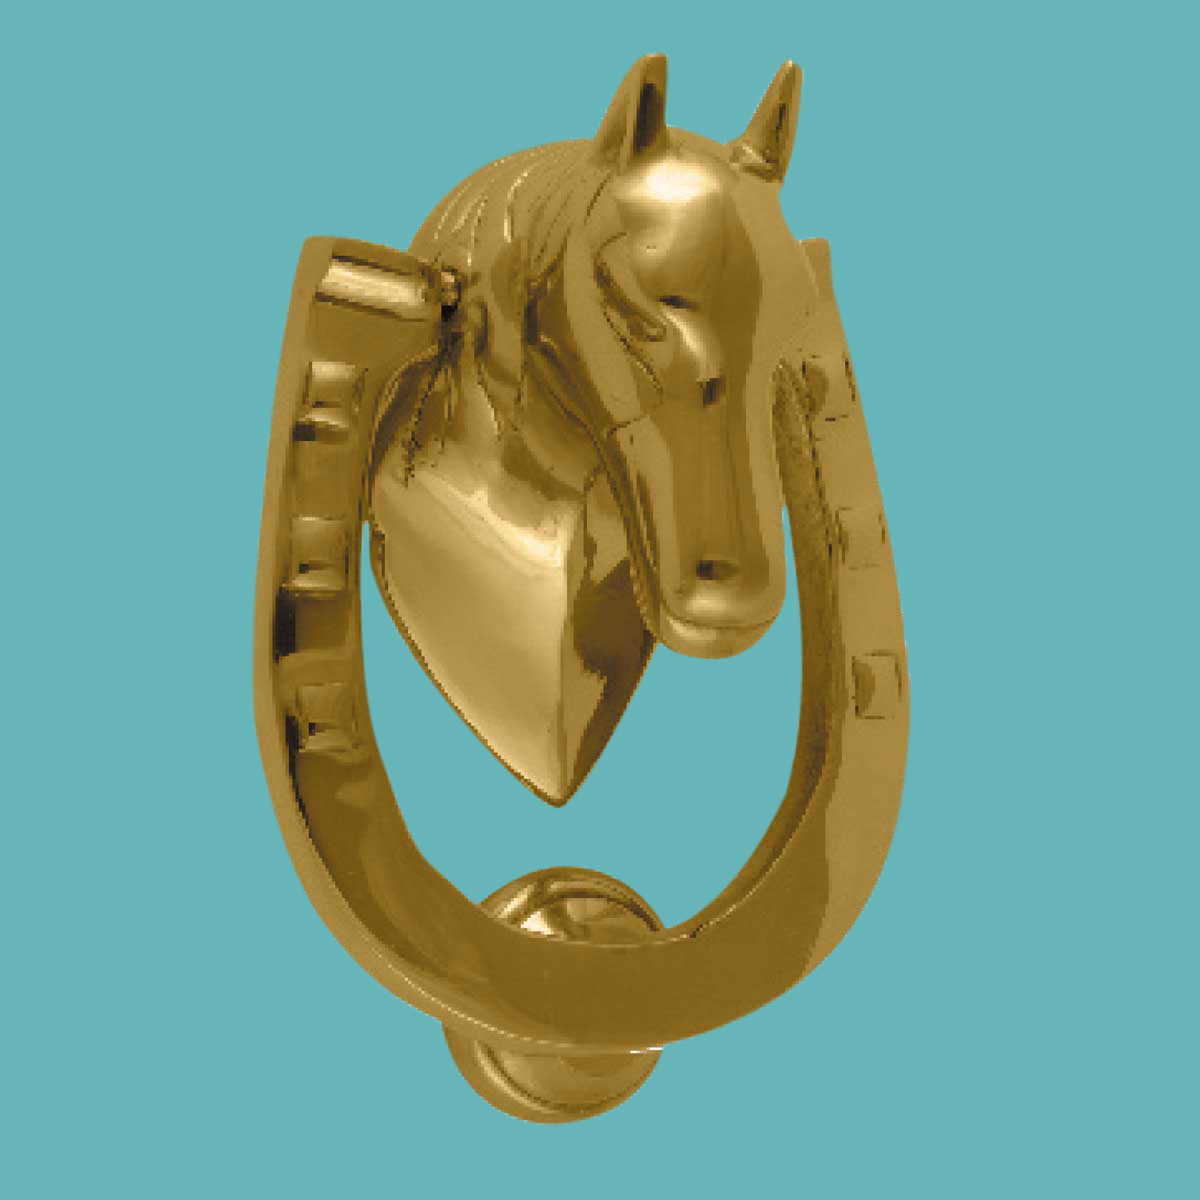 Door Knocker Horse Head Iron Brass Chrome 5 1 4 H X 4 W Renovator 39 S Supply Ebay